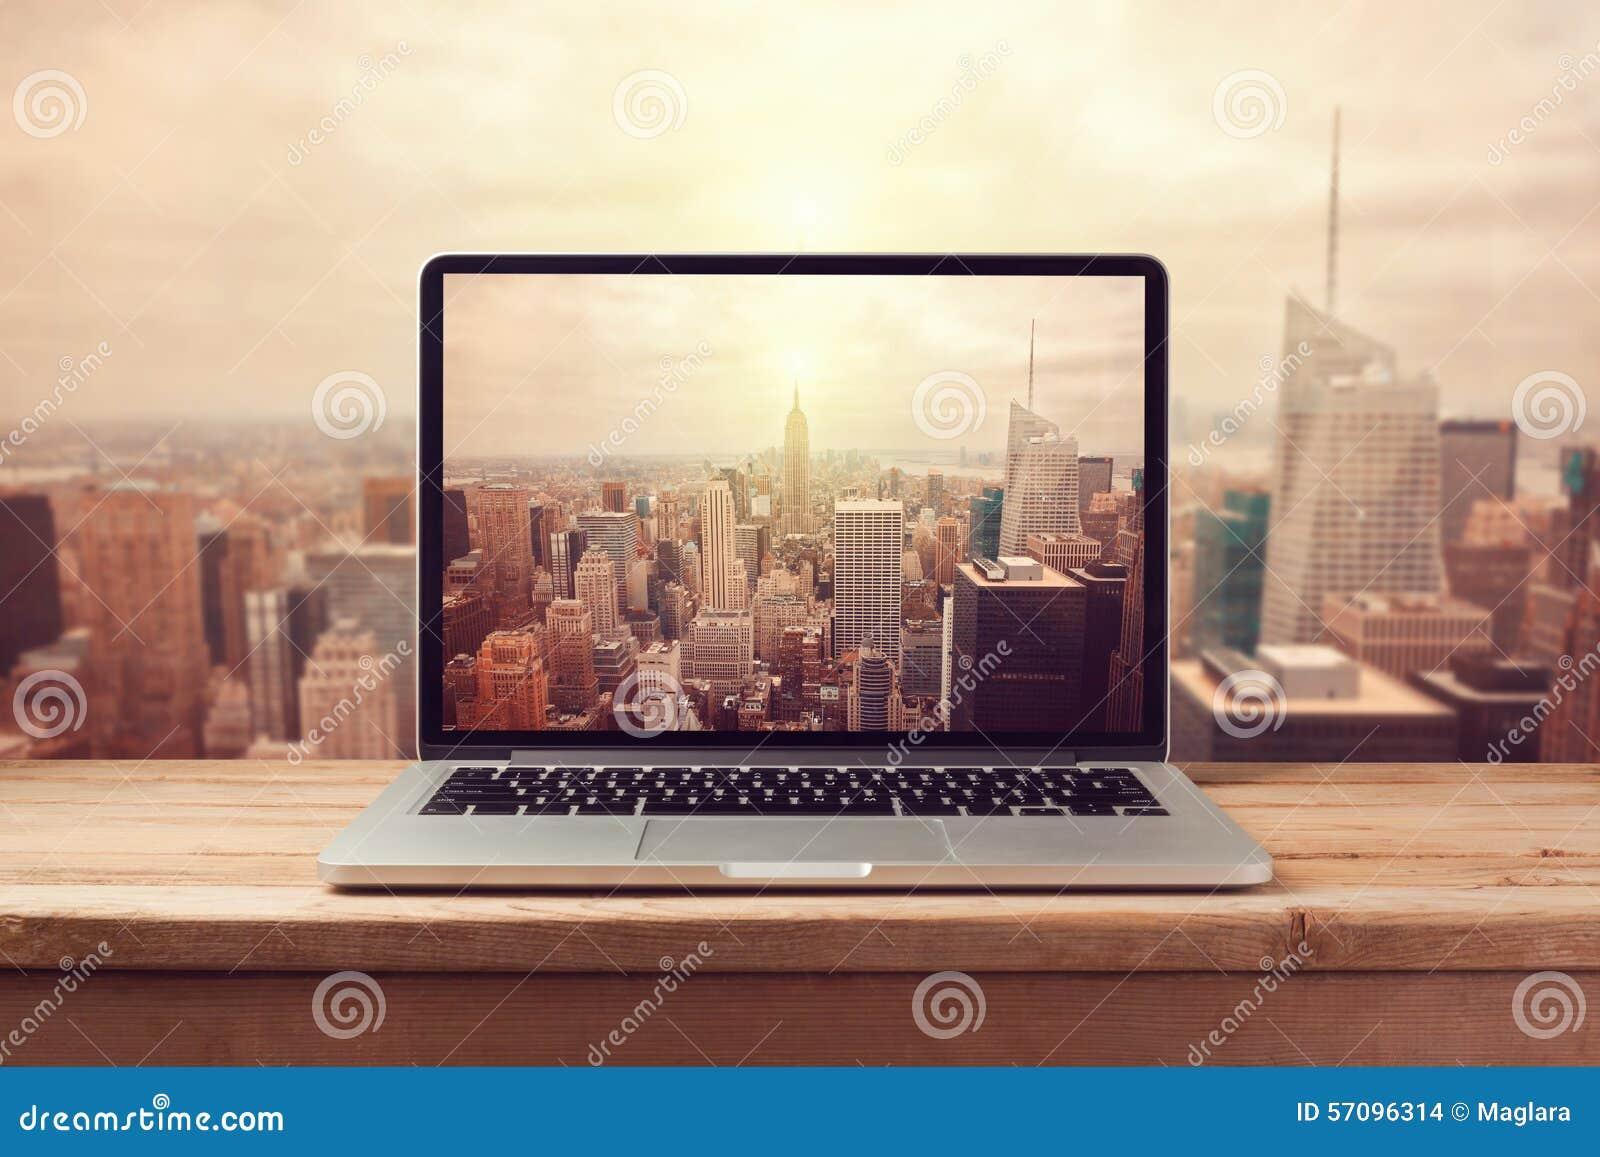 Laptop computer over New York city skyline. Retro filter effect